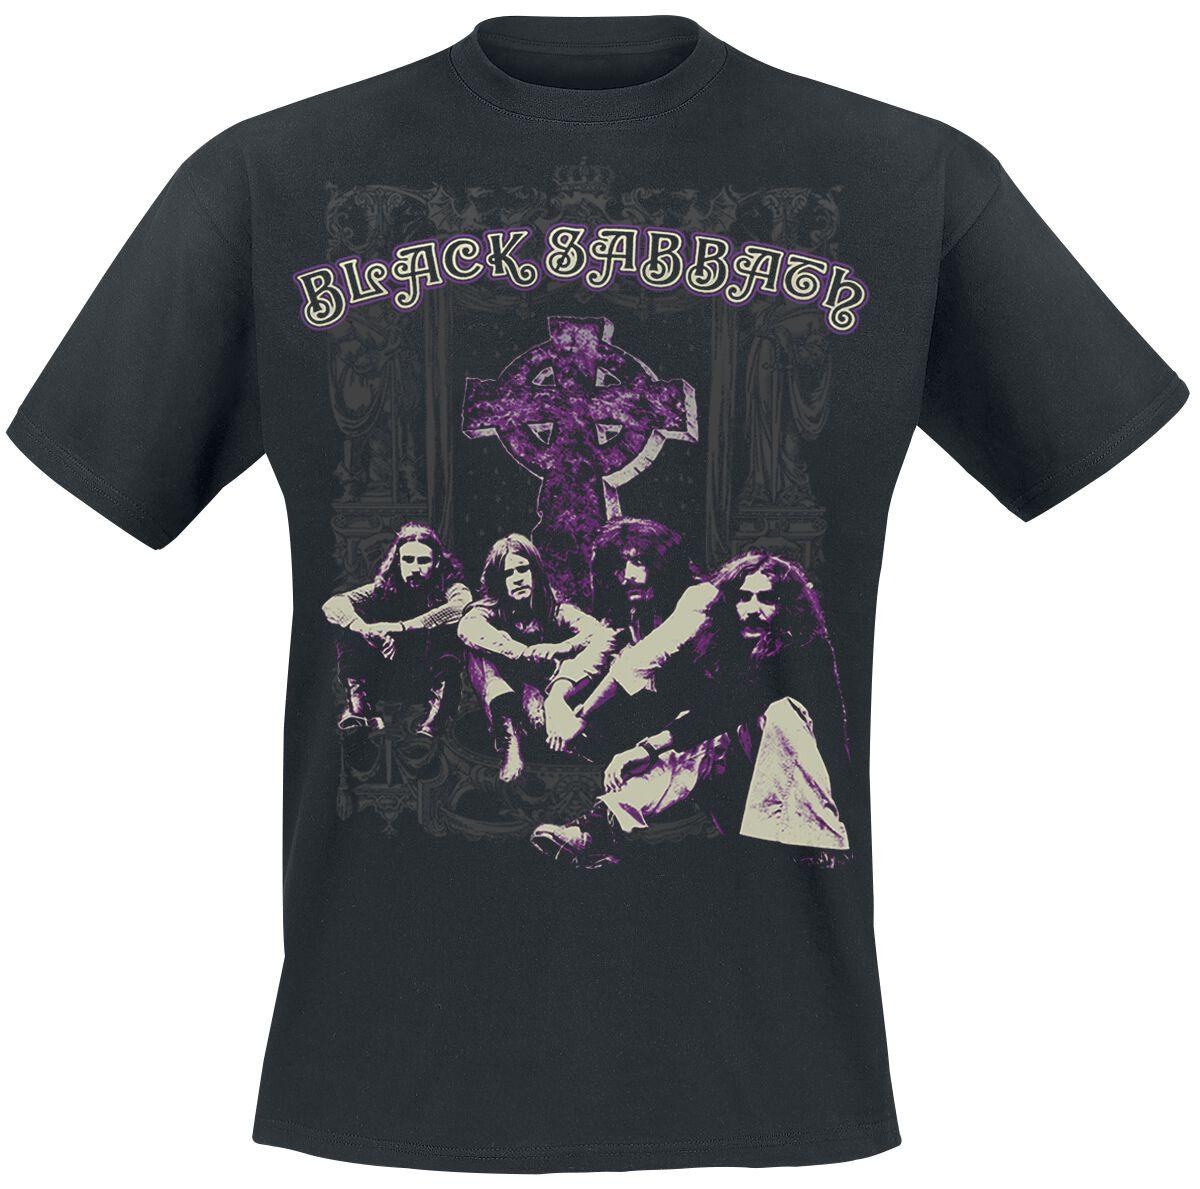 Image of   Black Sabbath Cross Group T-Shirt sort